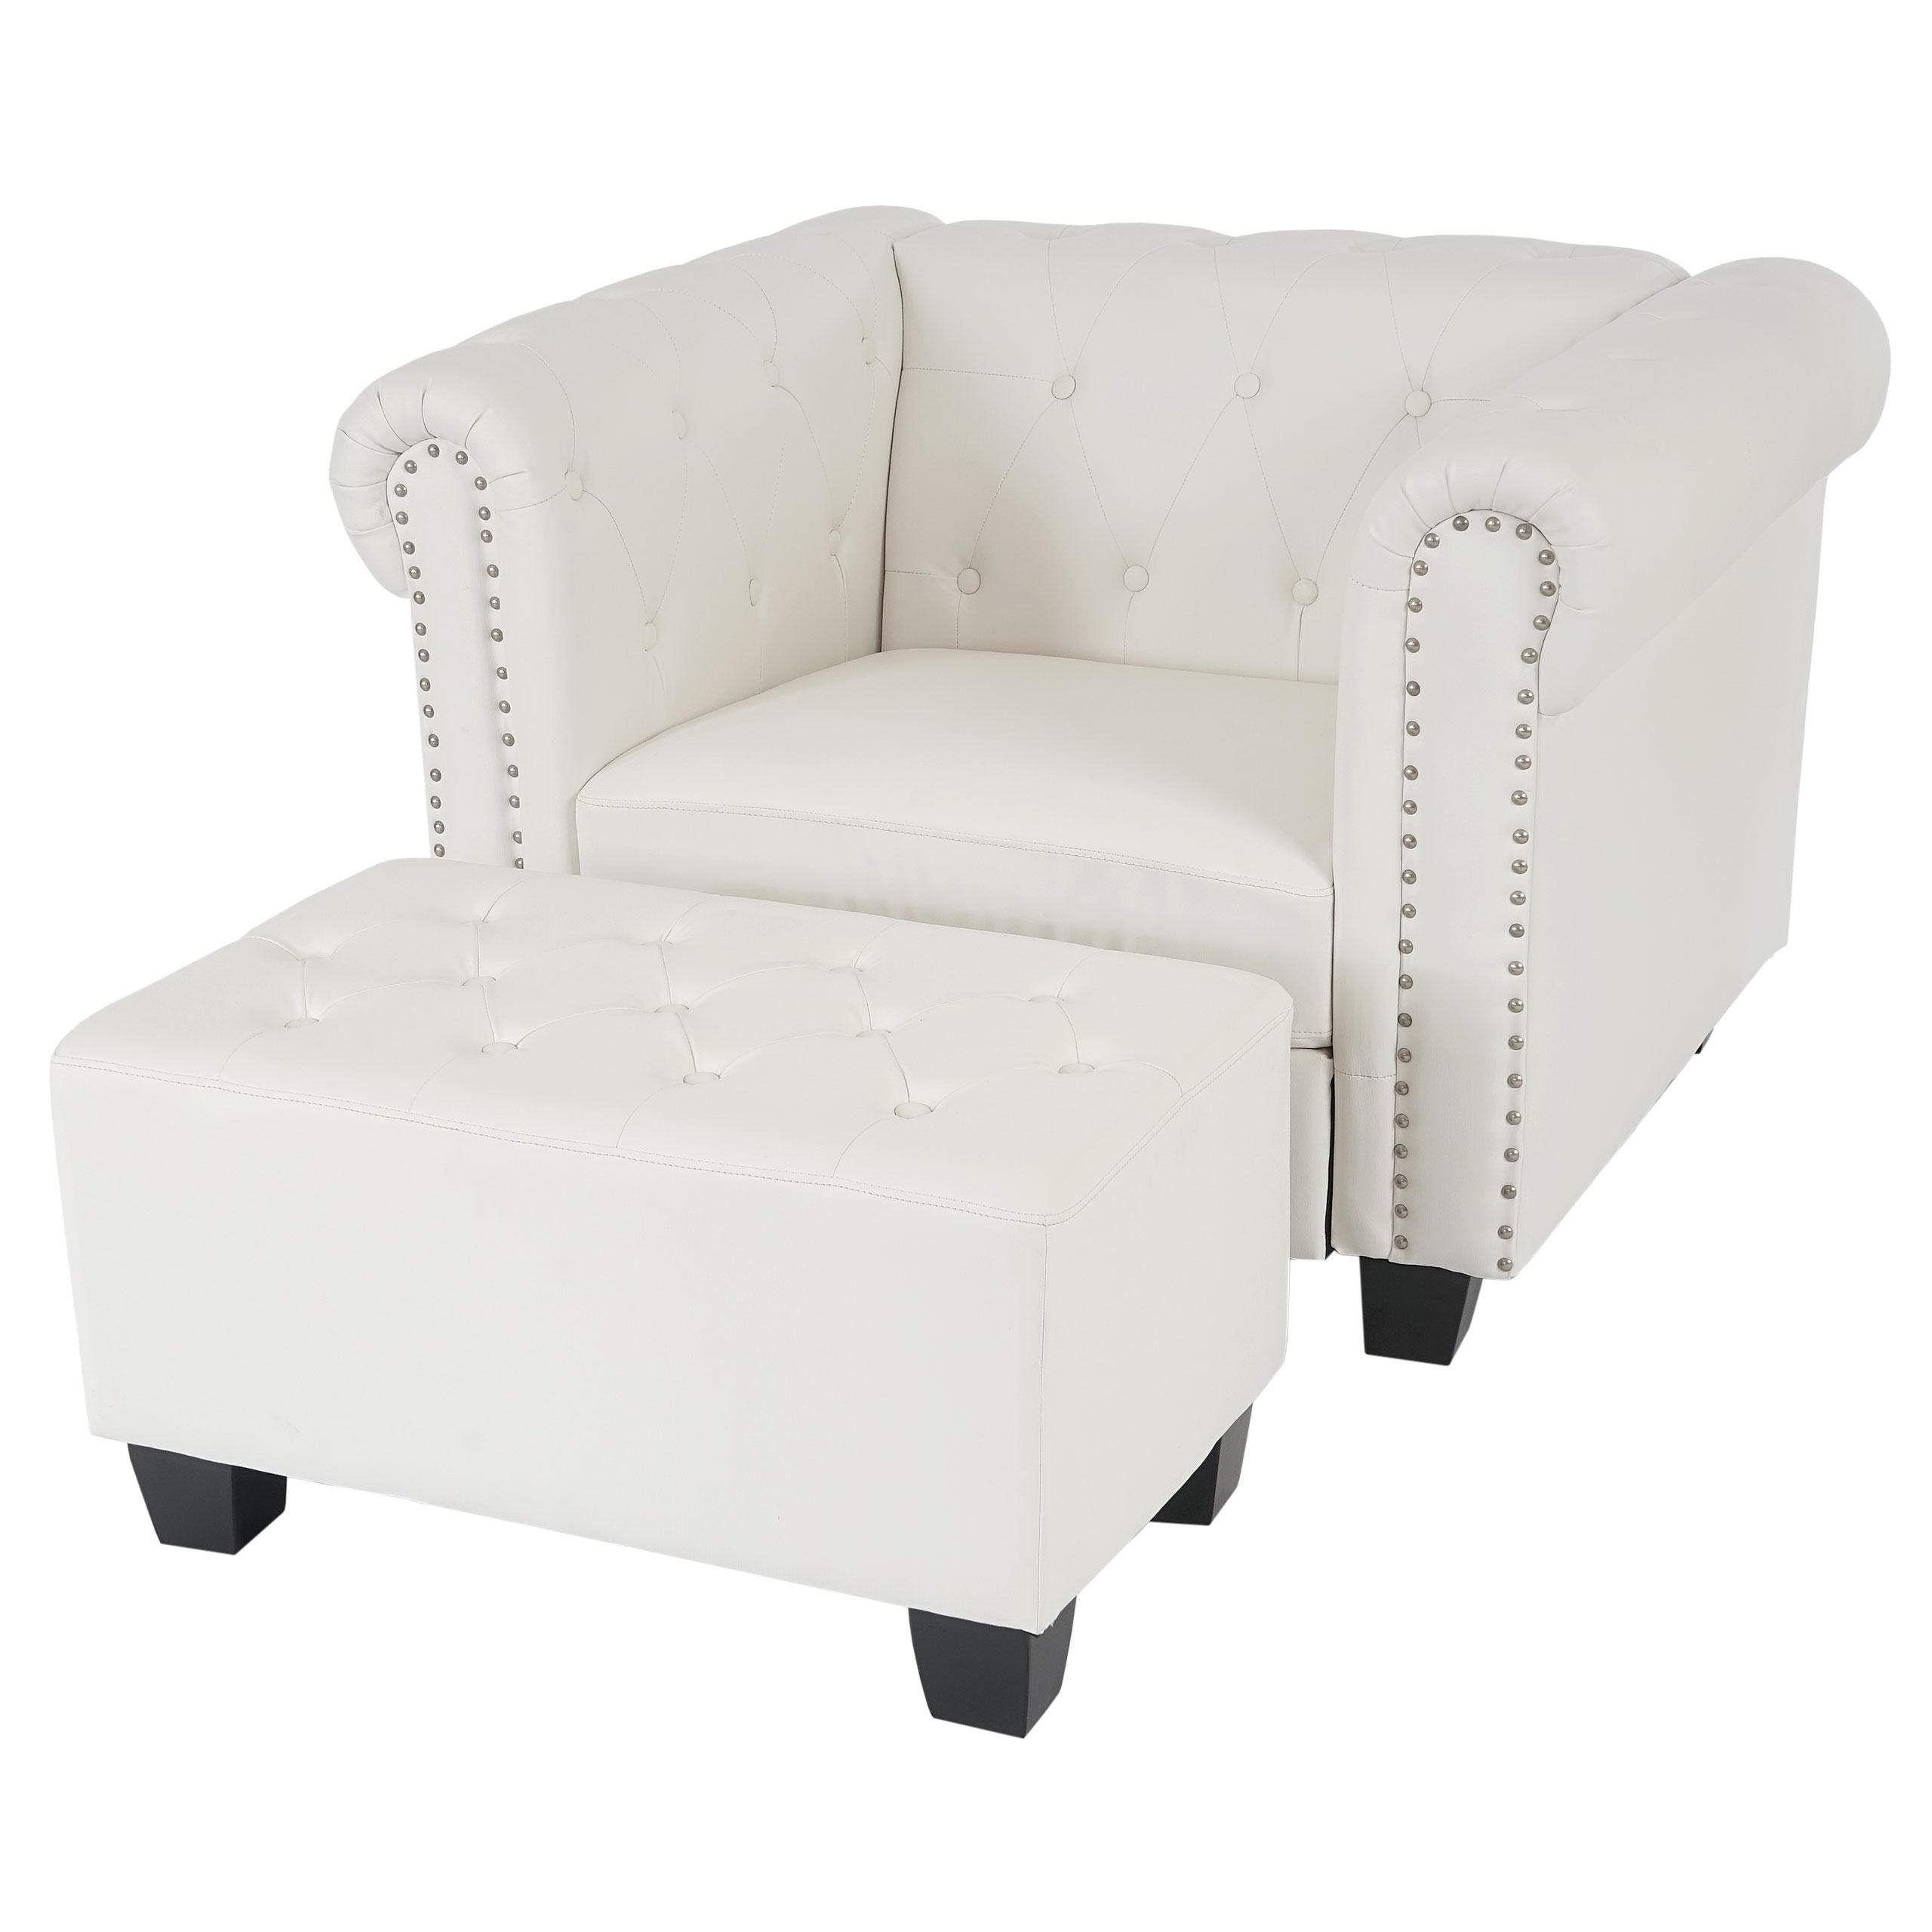 luxus sessel loungesessel relaxsessel chesterfield kunstleder eckige f e wei mit ottomane. Black Bedroom Furniture Sets. Home Design Ideas